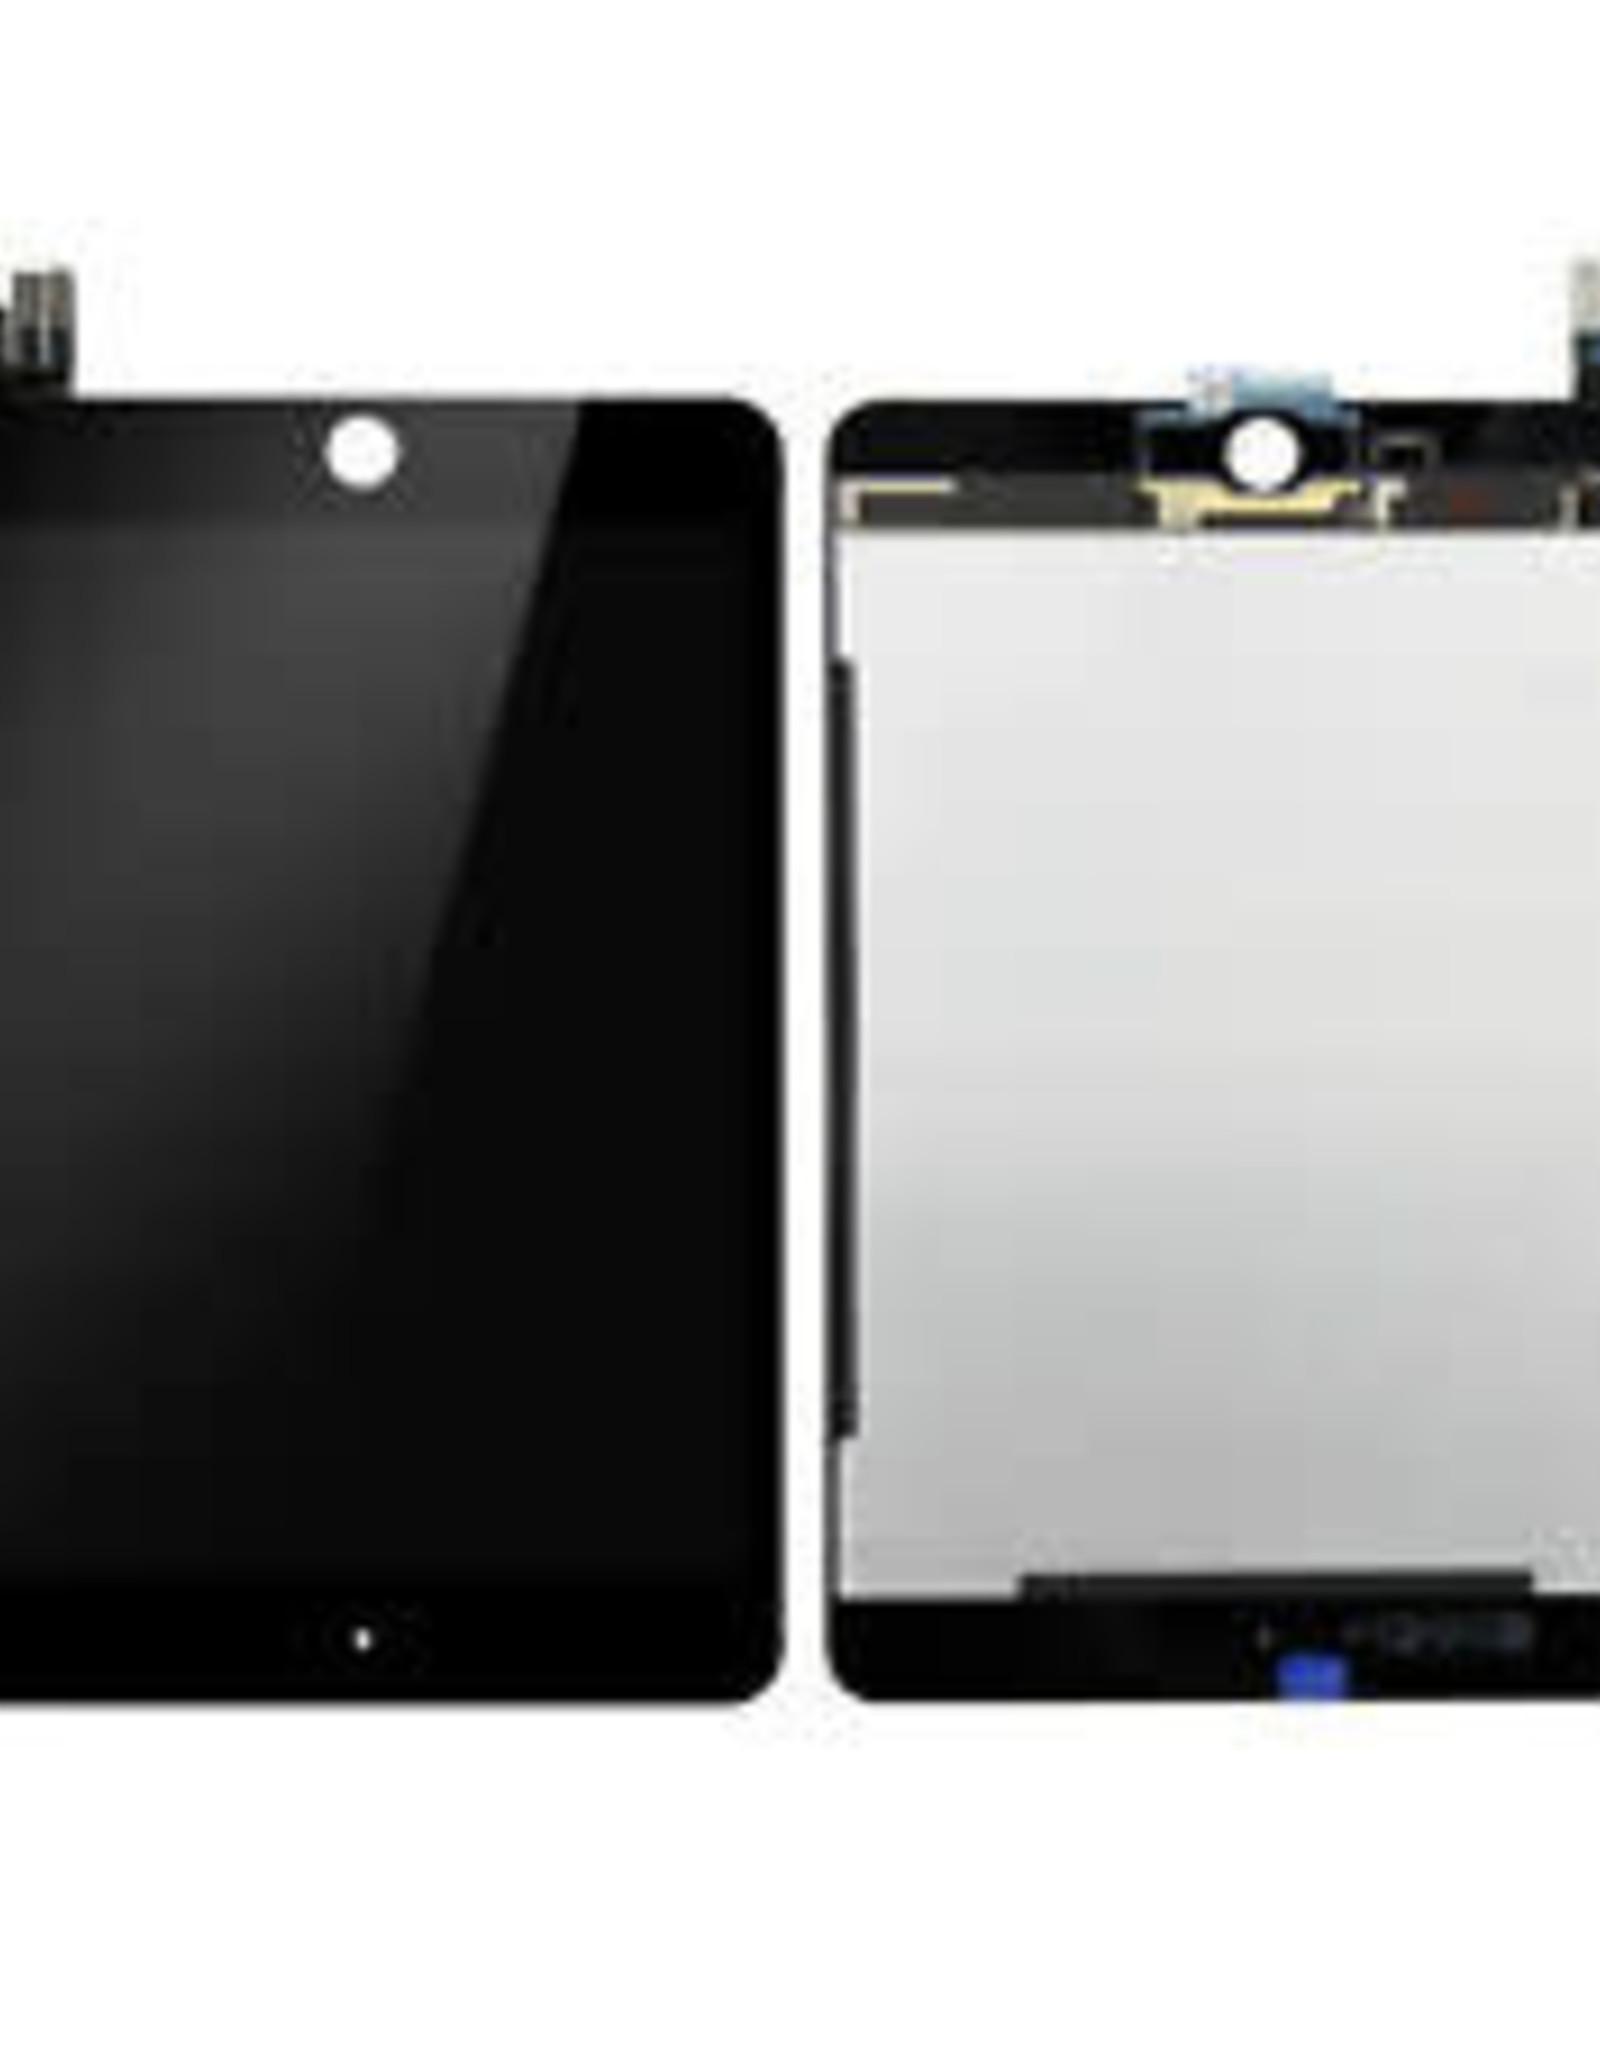 iPad Mini 5 A2124 A2125 A2126 A2133 LCD + Digitizer Assembly